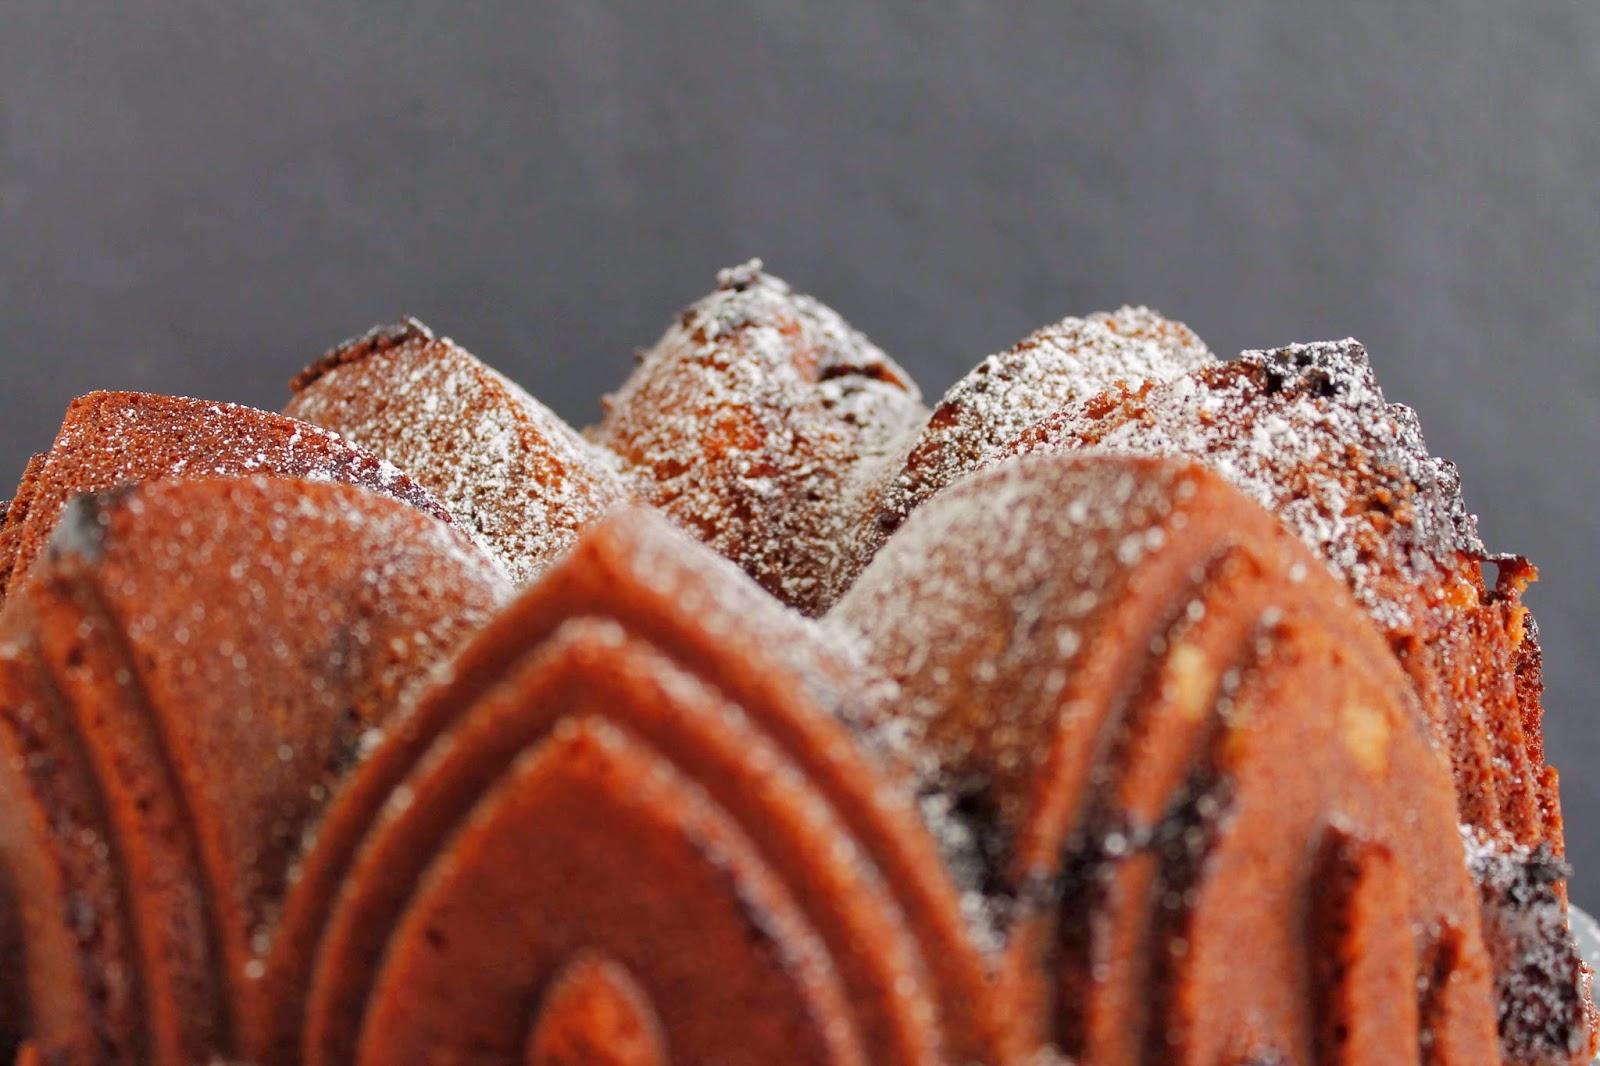 Receta Butter & Jam Bundt cake o Bundt cake de mantequilla y confitura de cerezas